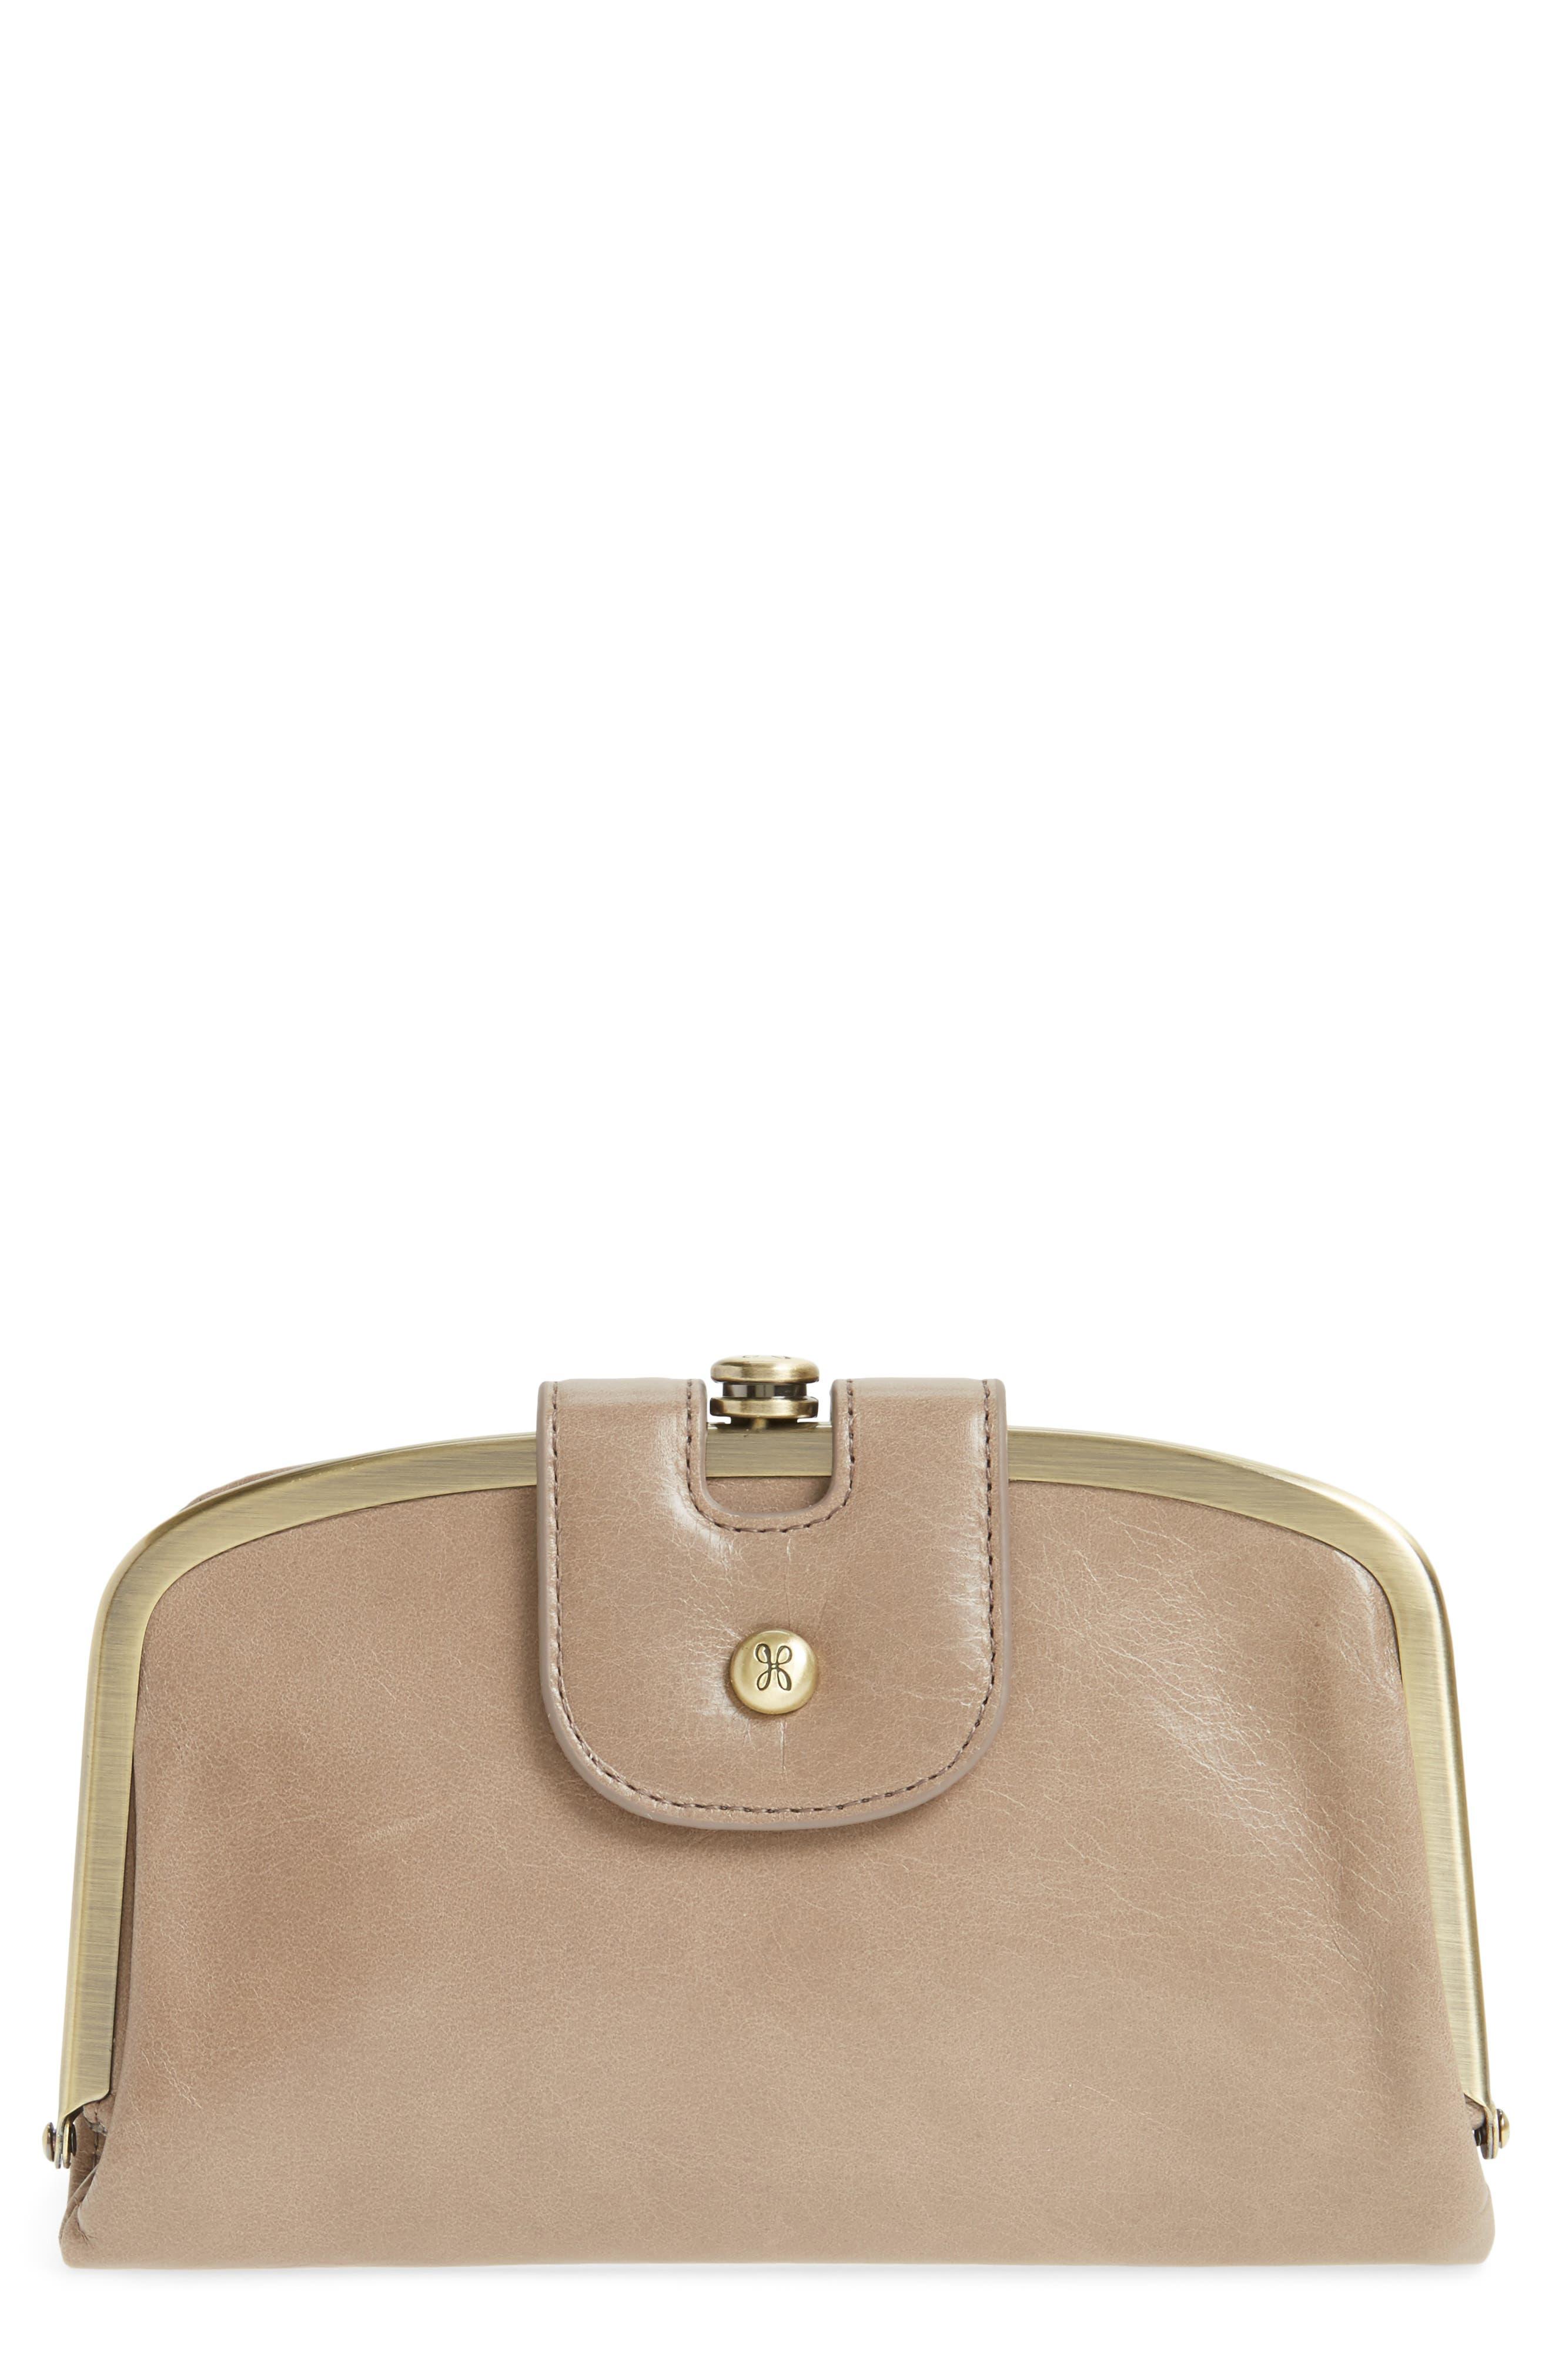 HOBO Halo Calfskin Leather Wallet